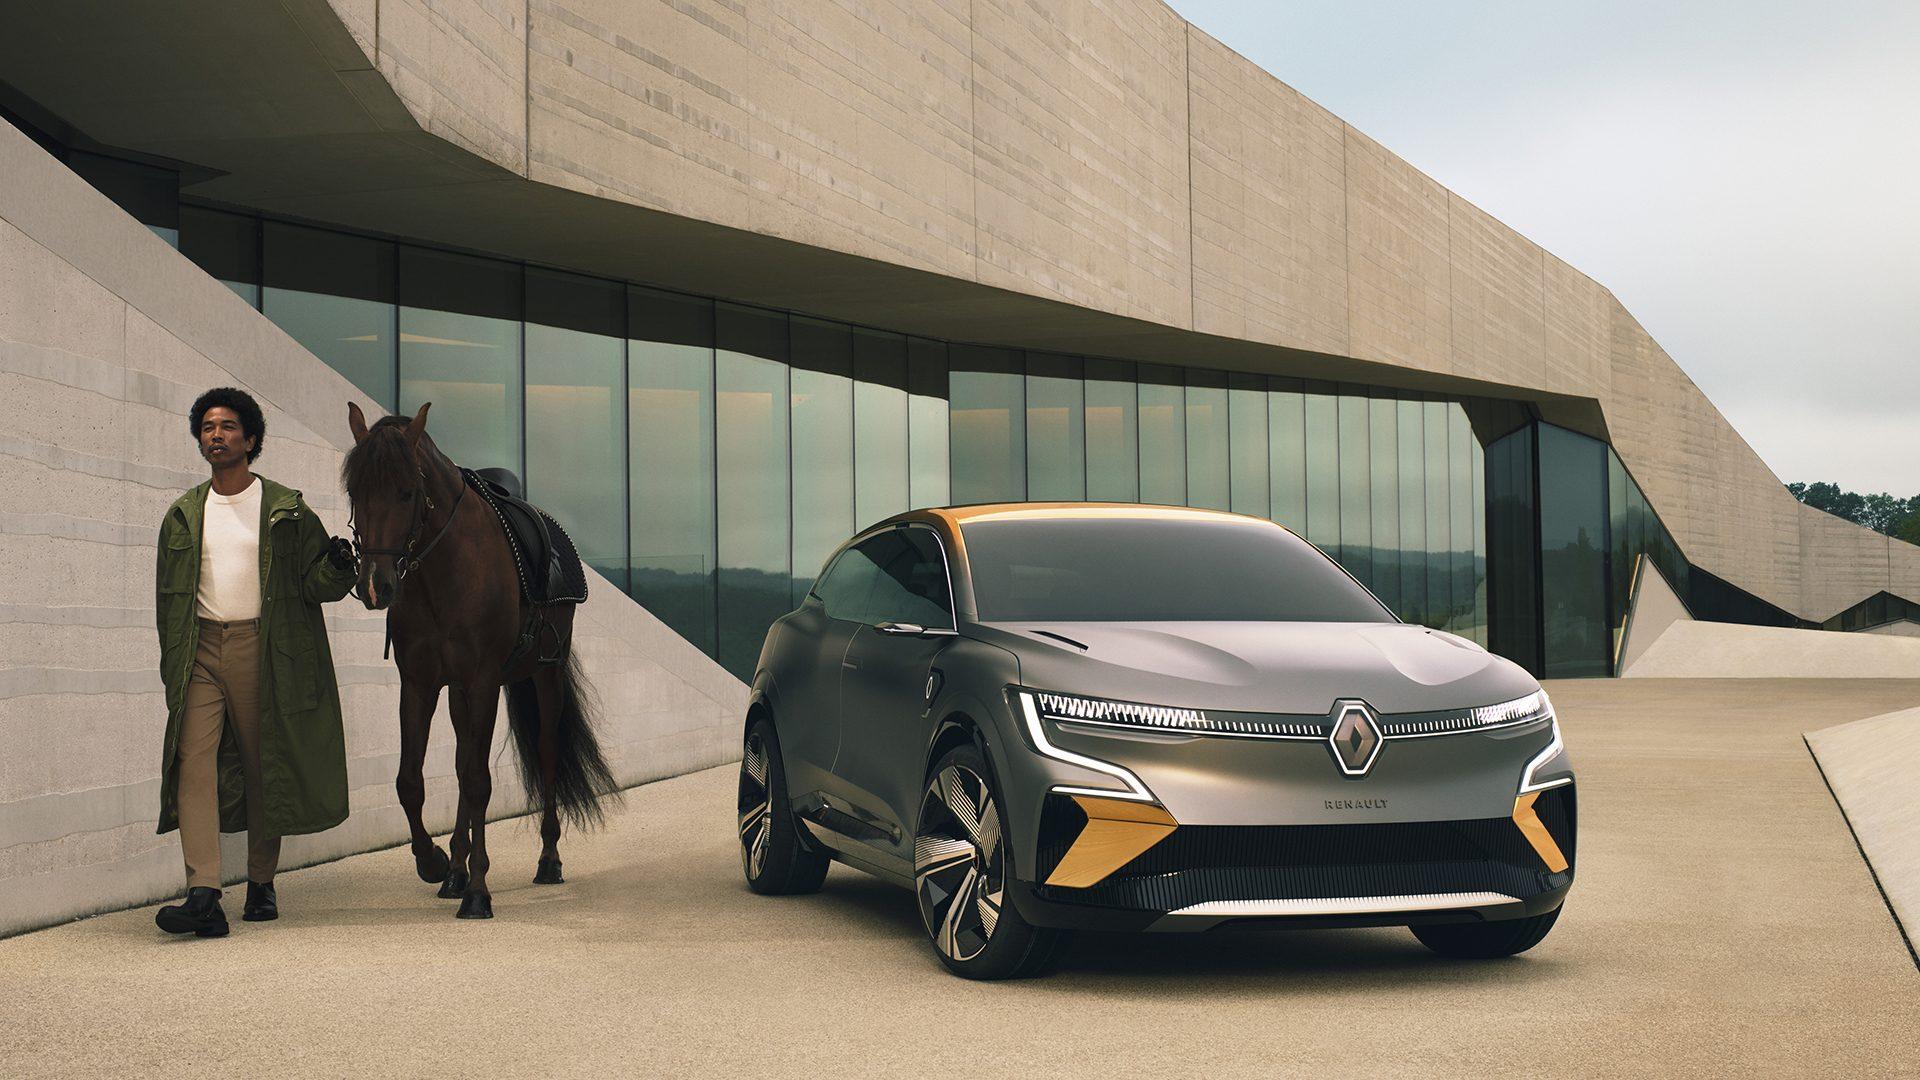 2020-Renault-Megane-eVision-Concept-13